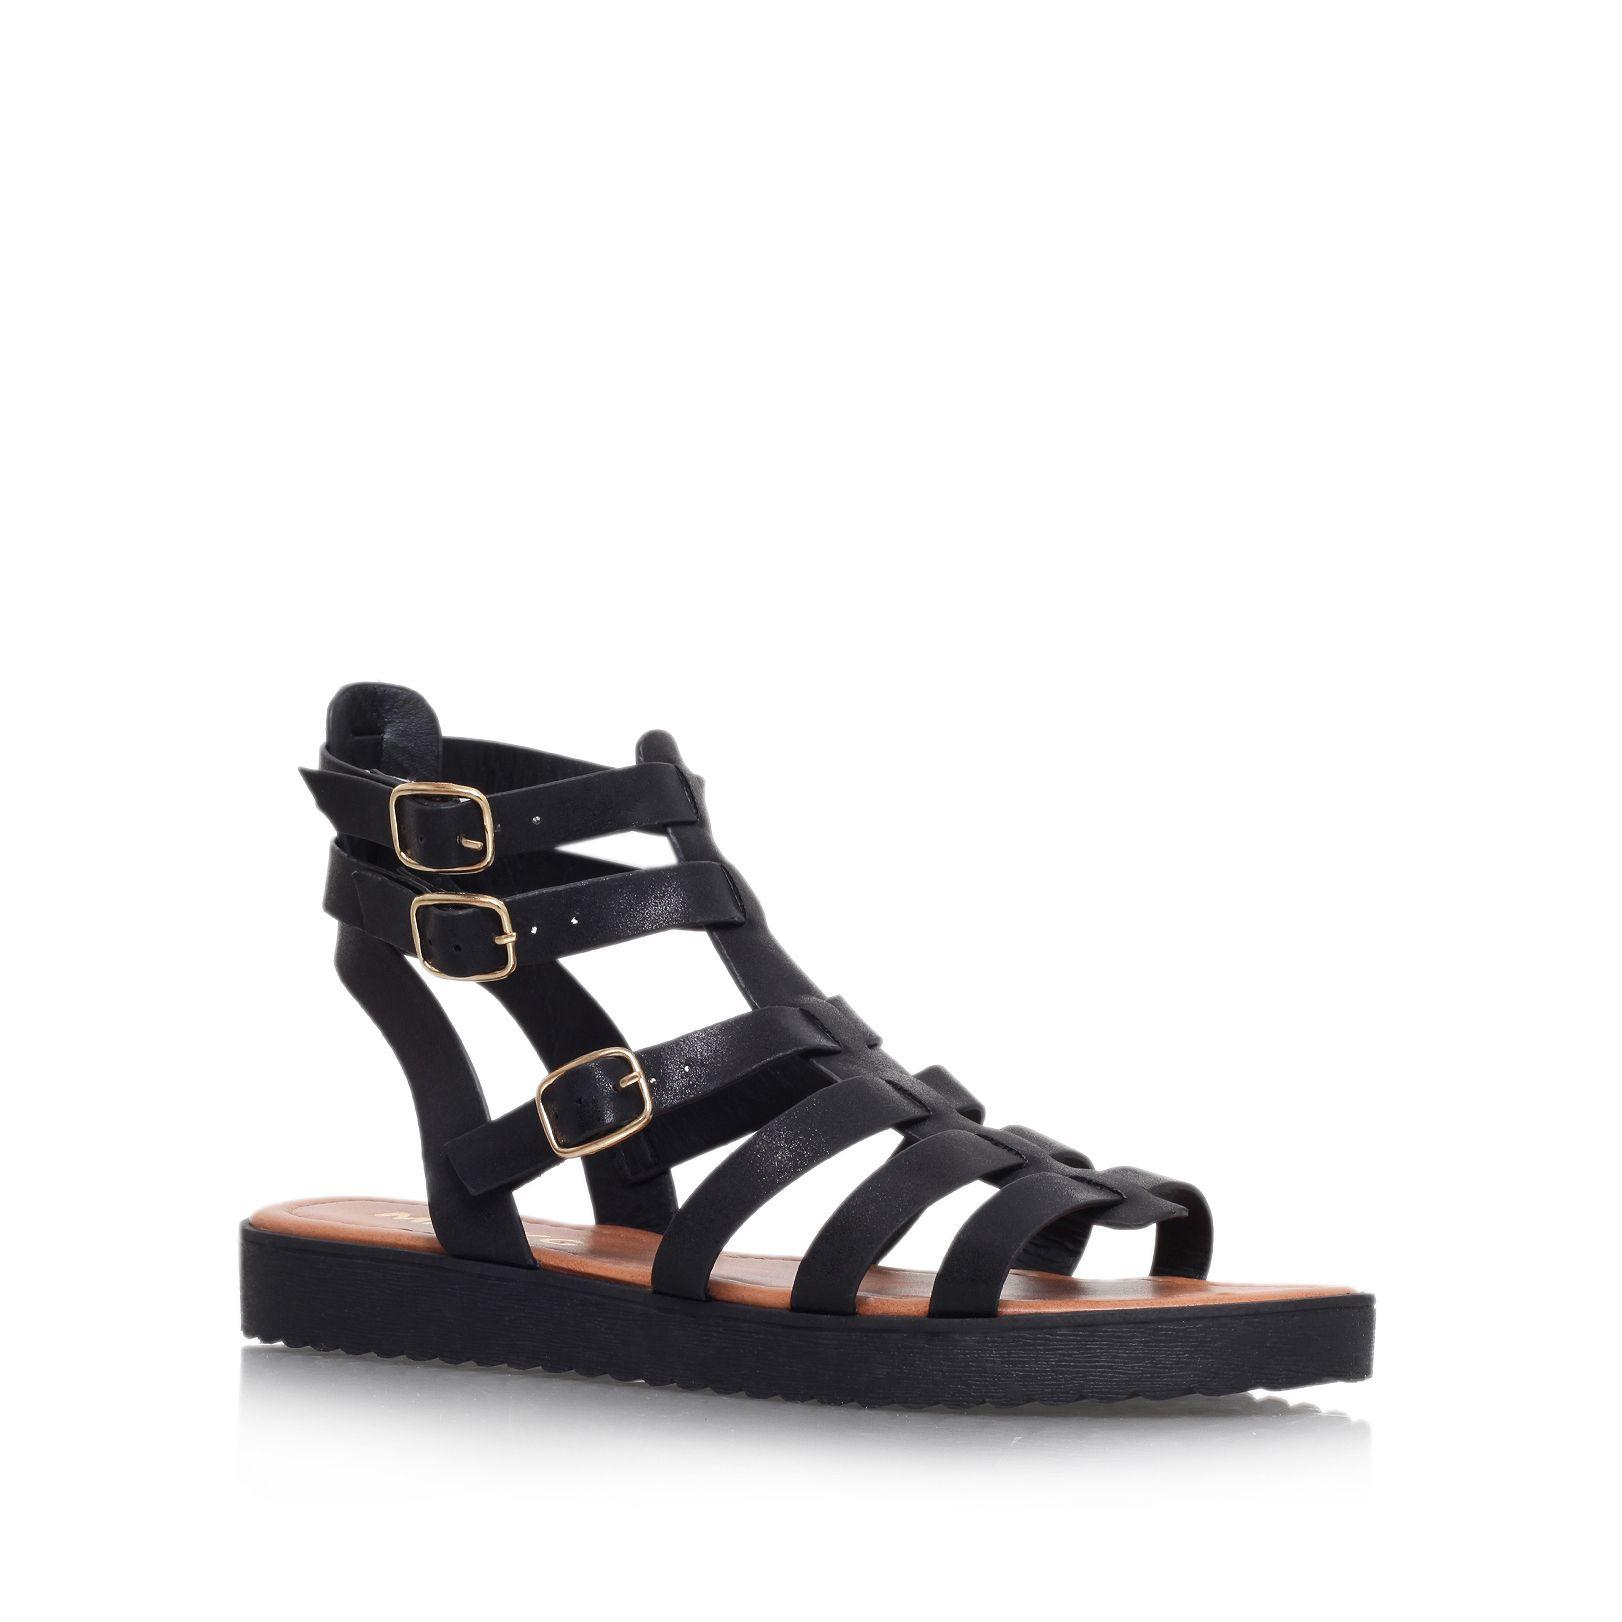 miss kg flat strappy sandals in black lyst